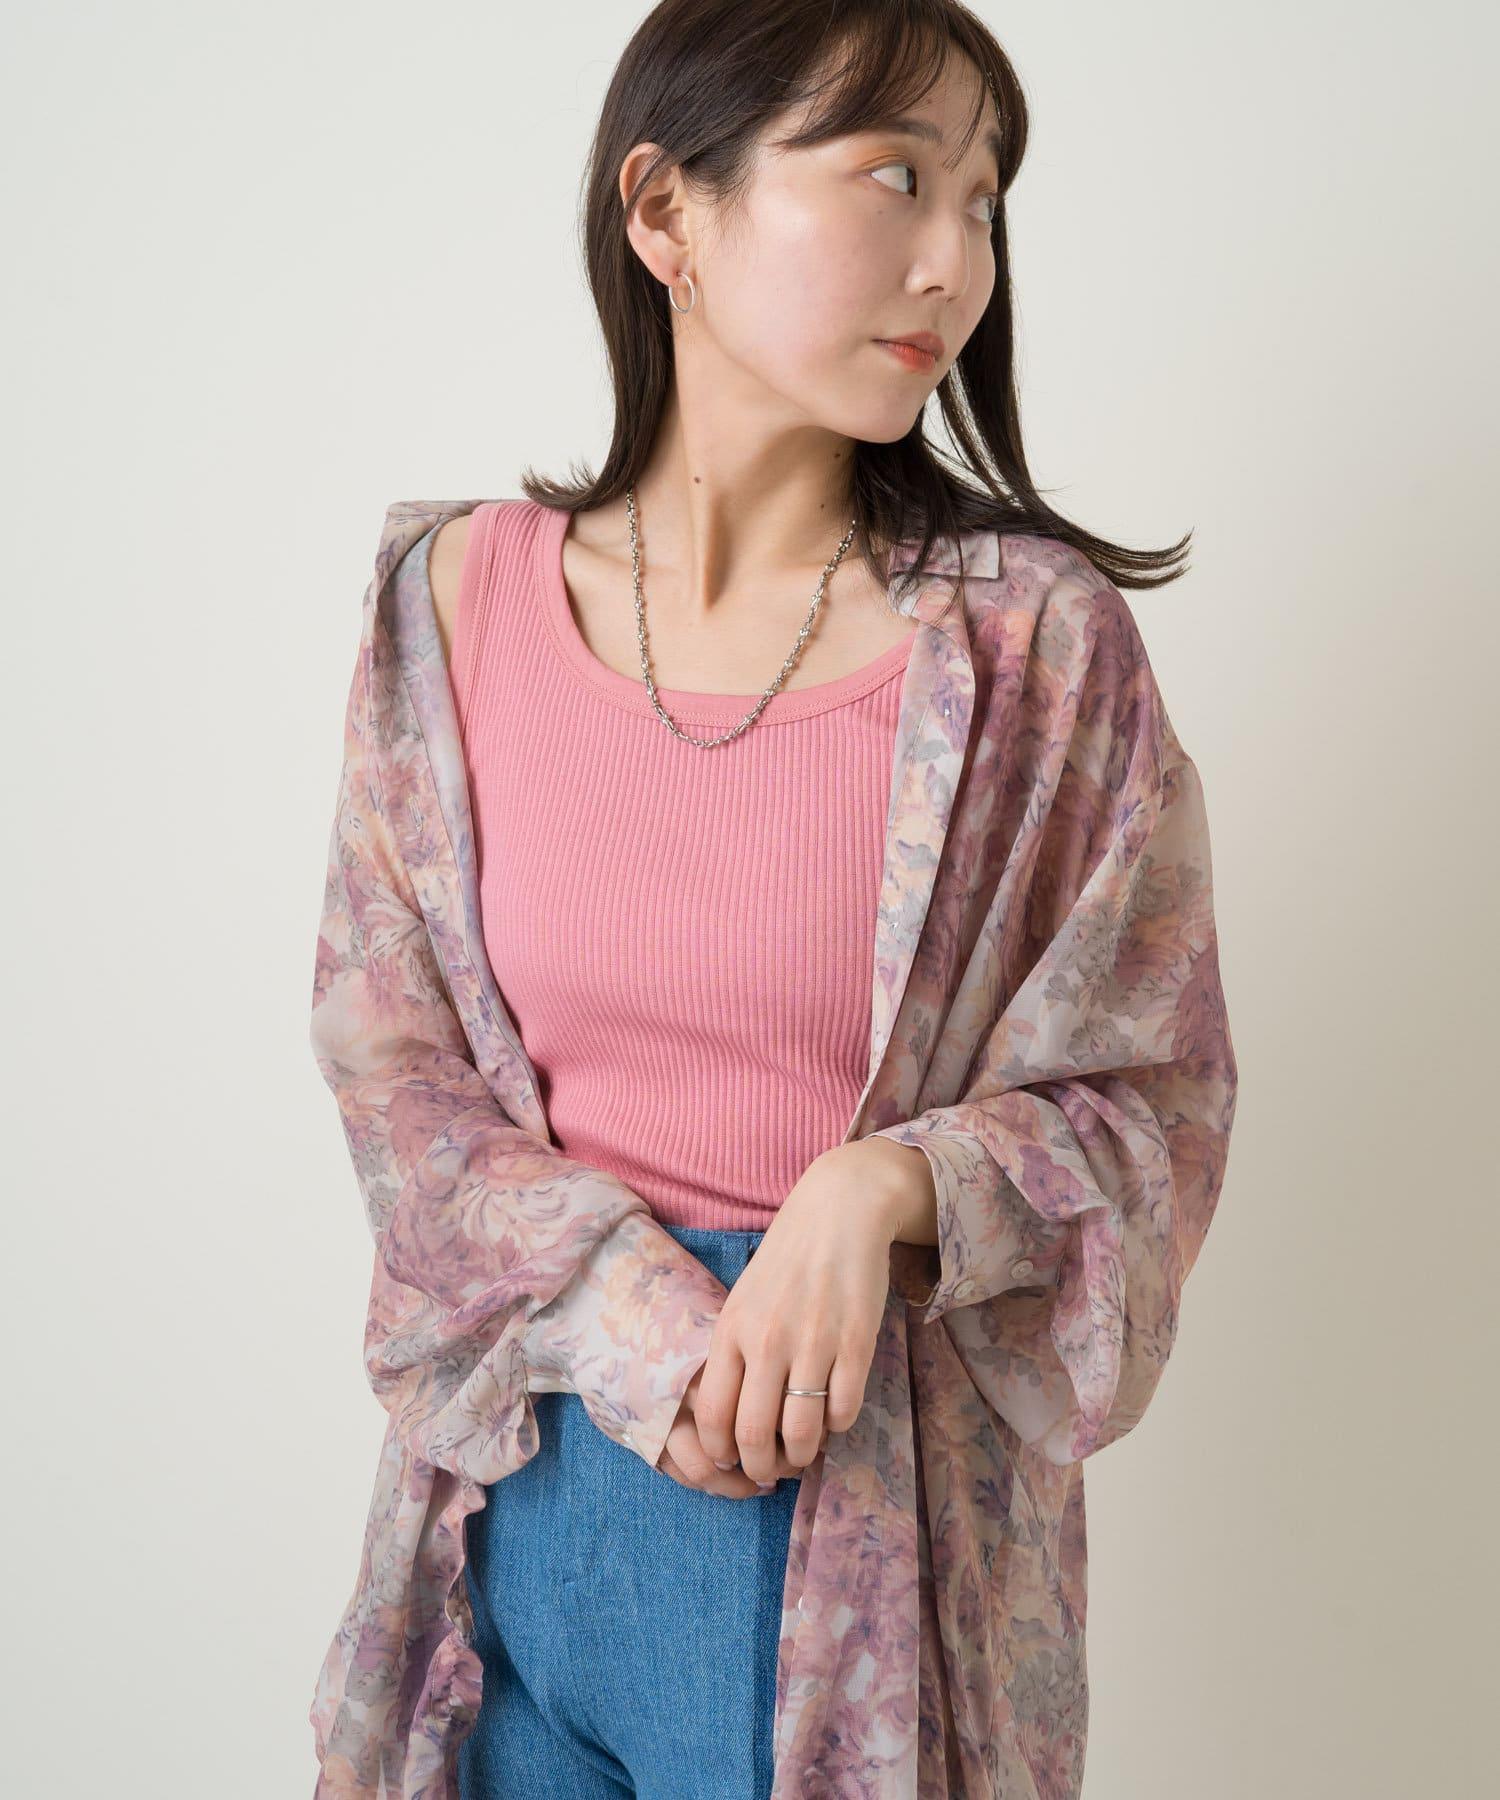 Kastane(カスタネ) SET UP Flower Print Shear Shirts